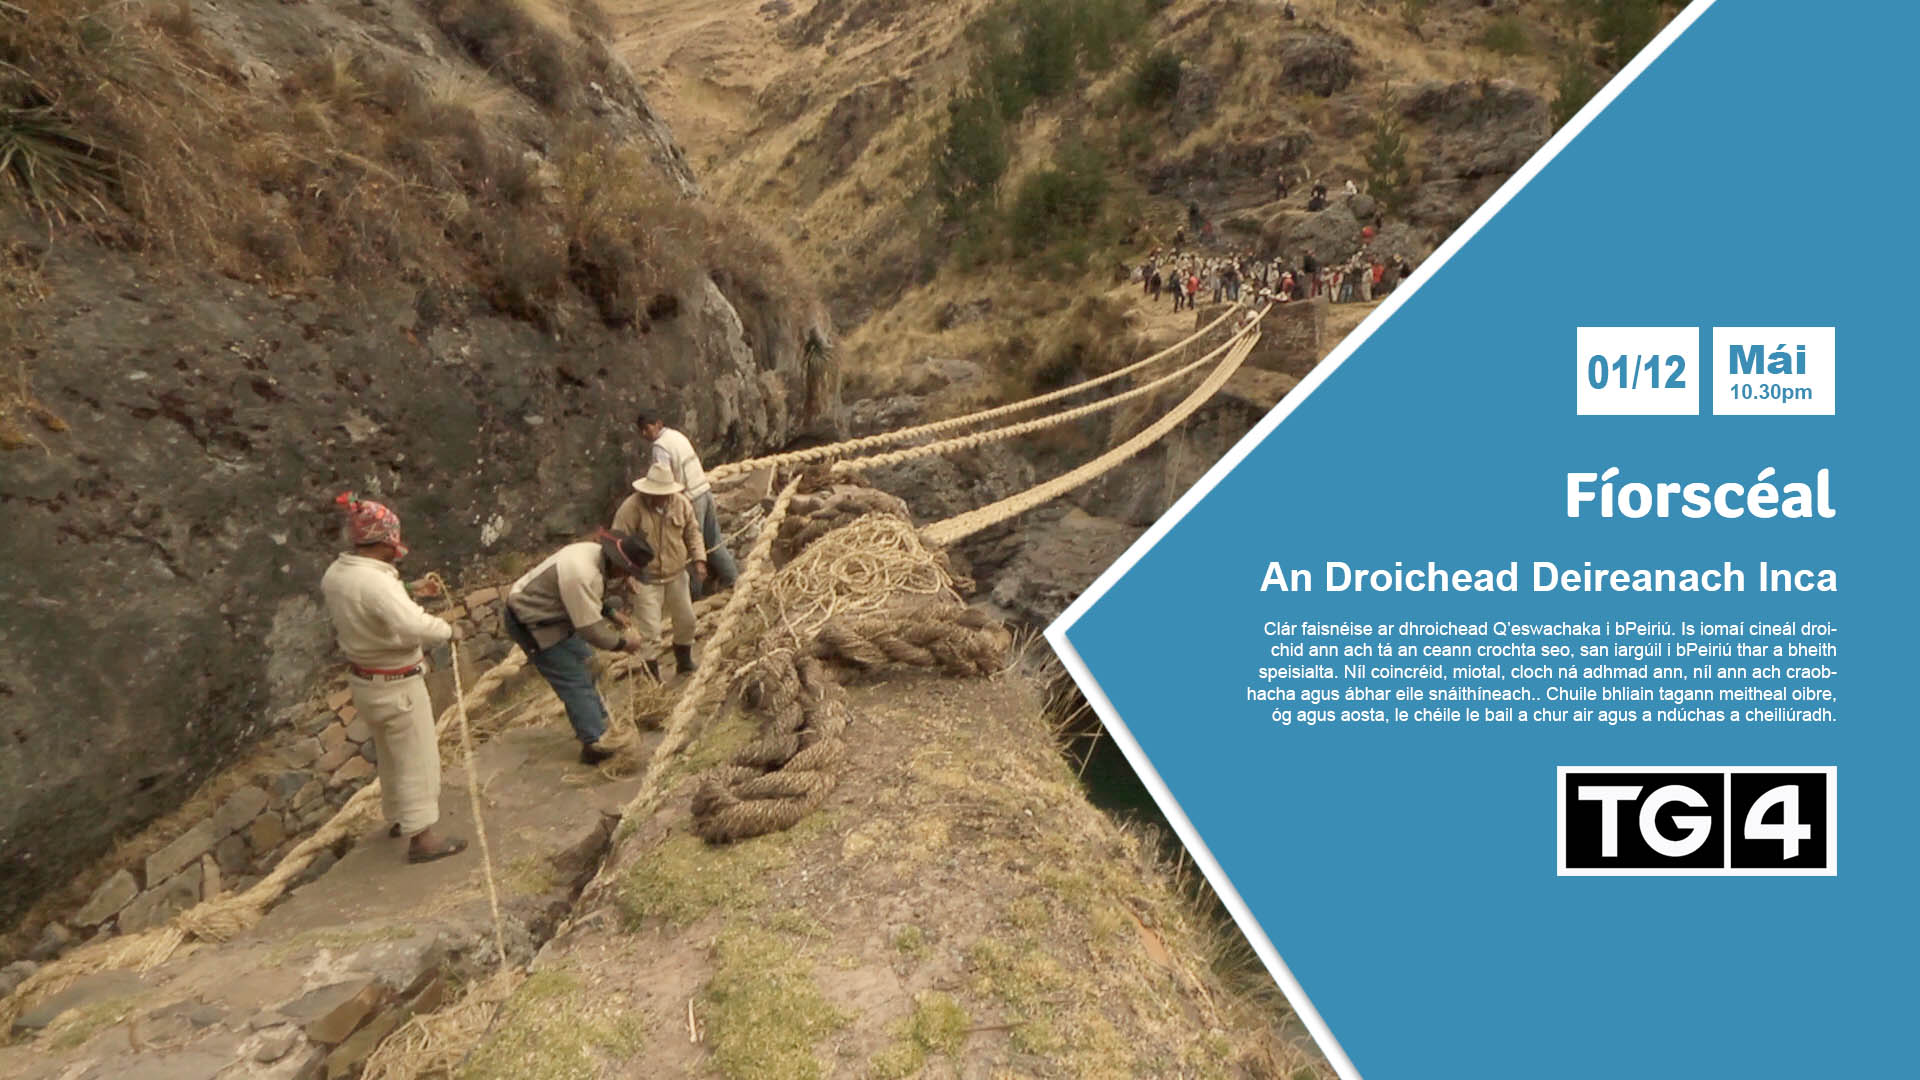 Documental Q'eswachaka